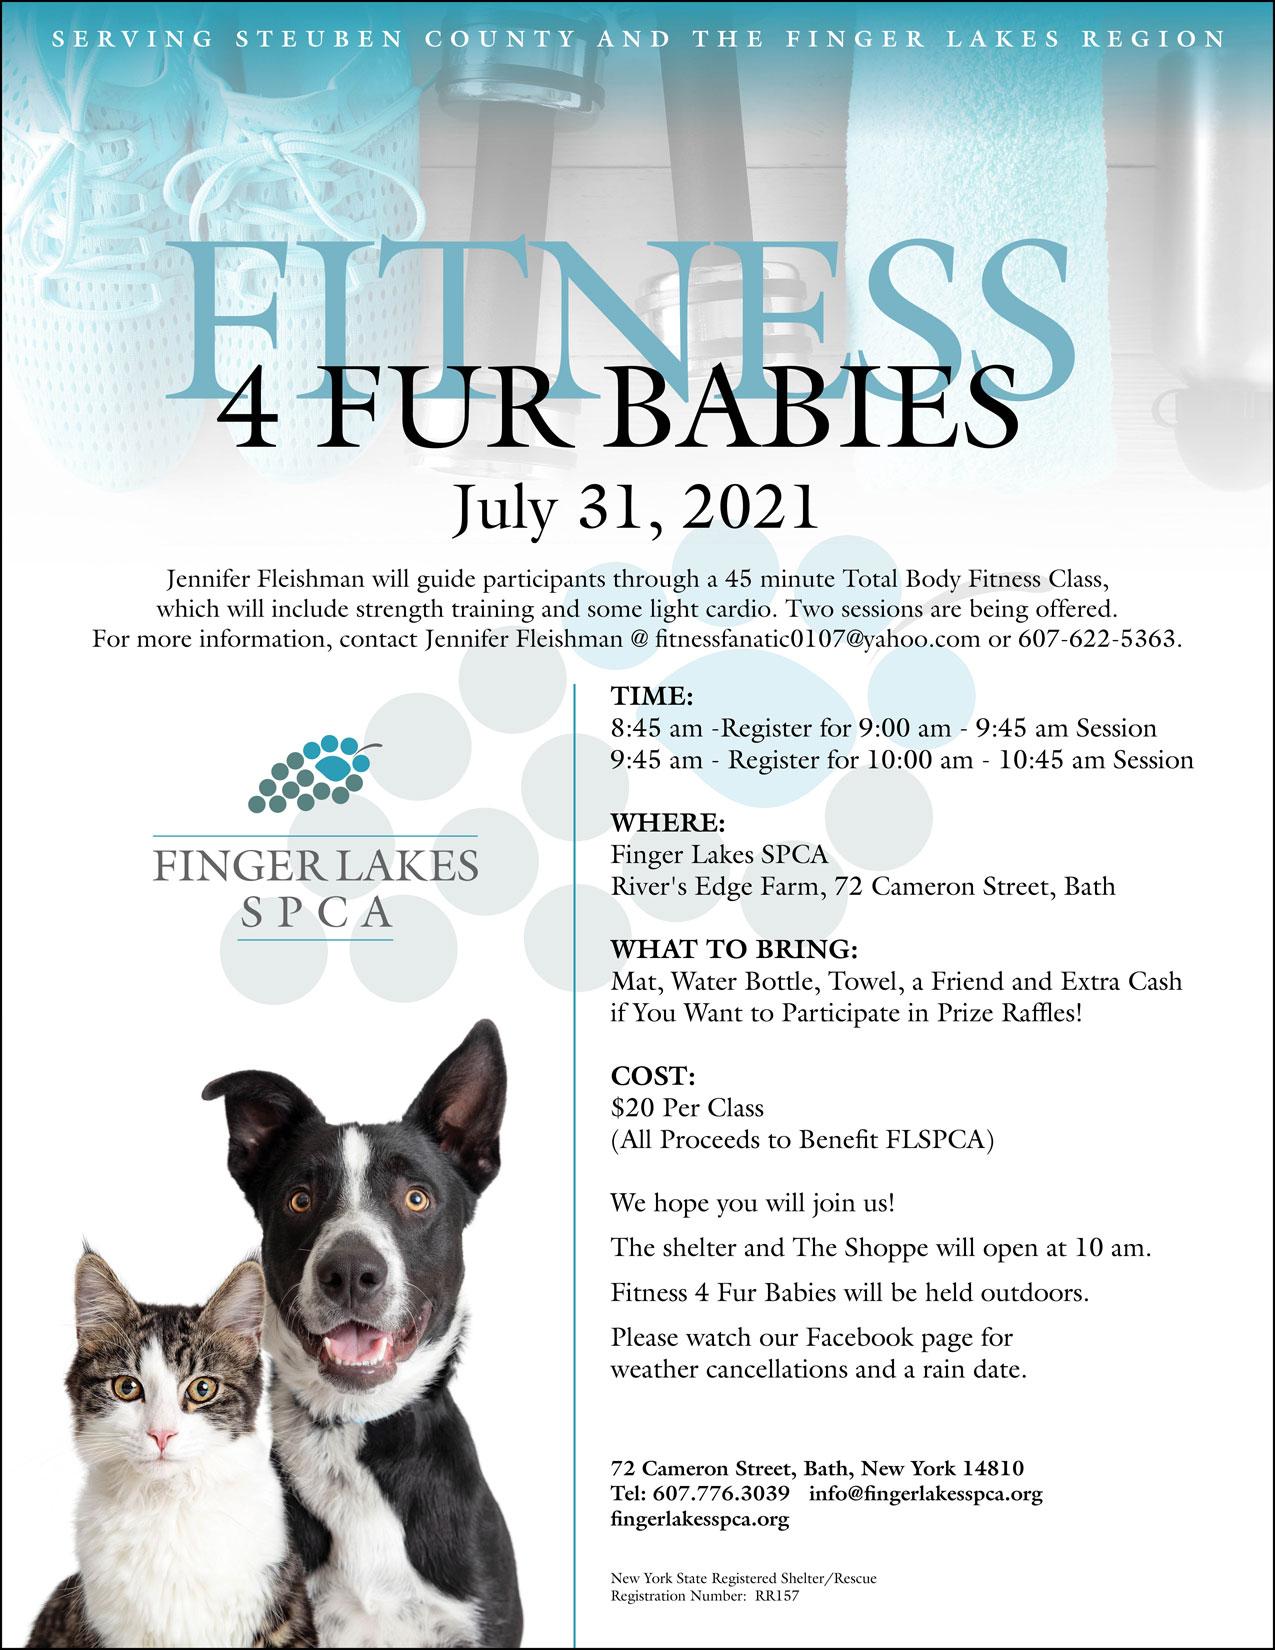 Finger Lakes SPCA | Fitness 4 Fur Babies